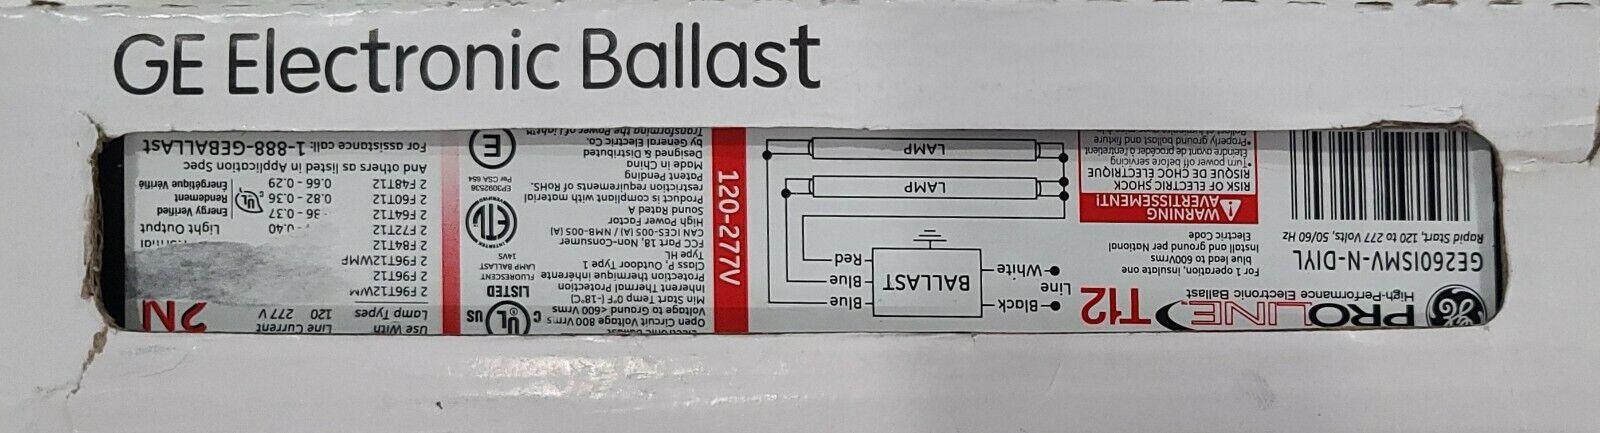 GE260-MV-N Electronic Fluorescent Ballast - $14.24